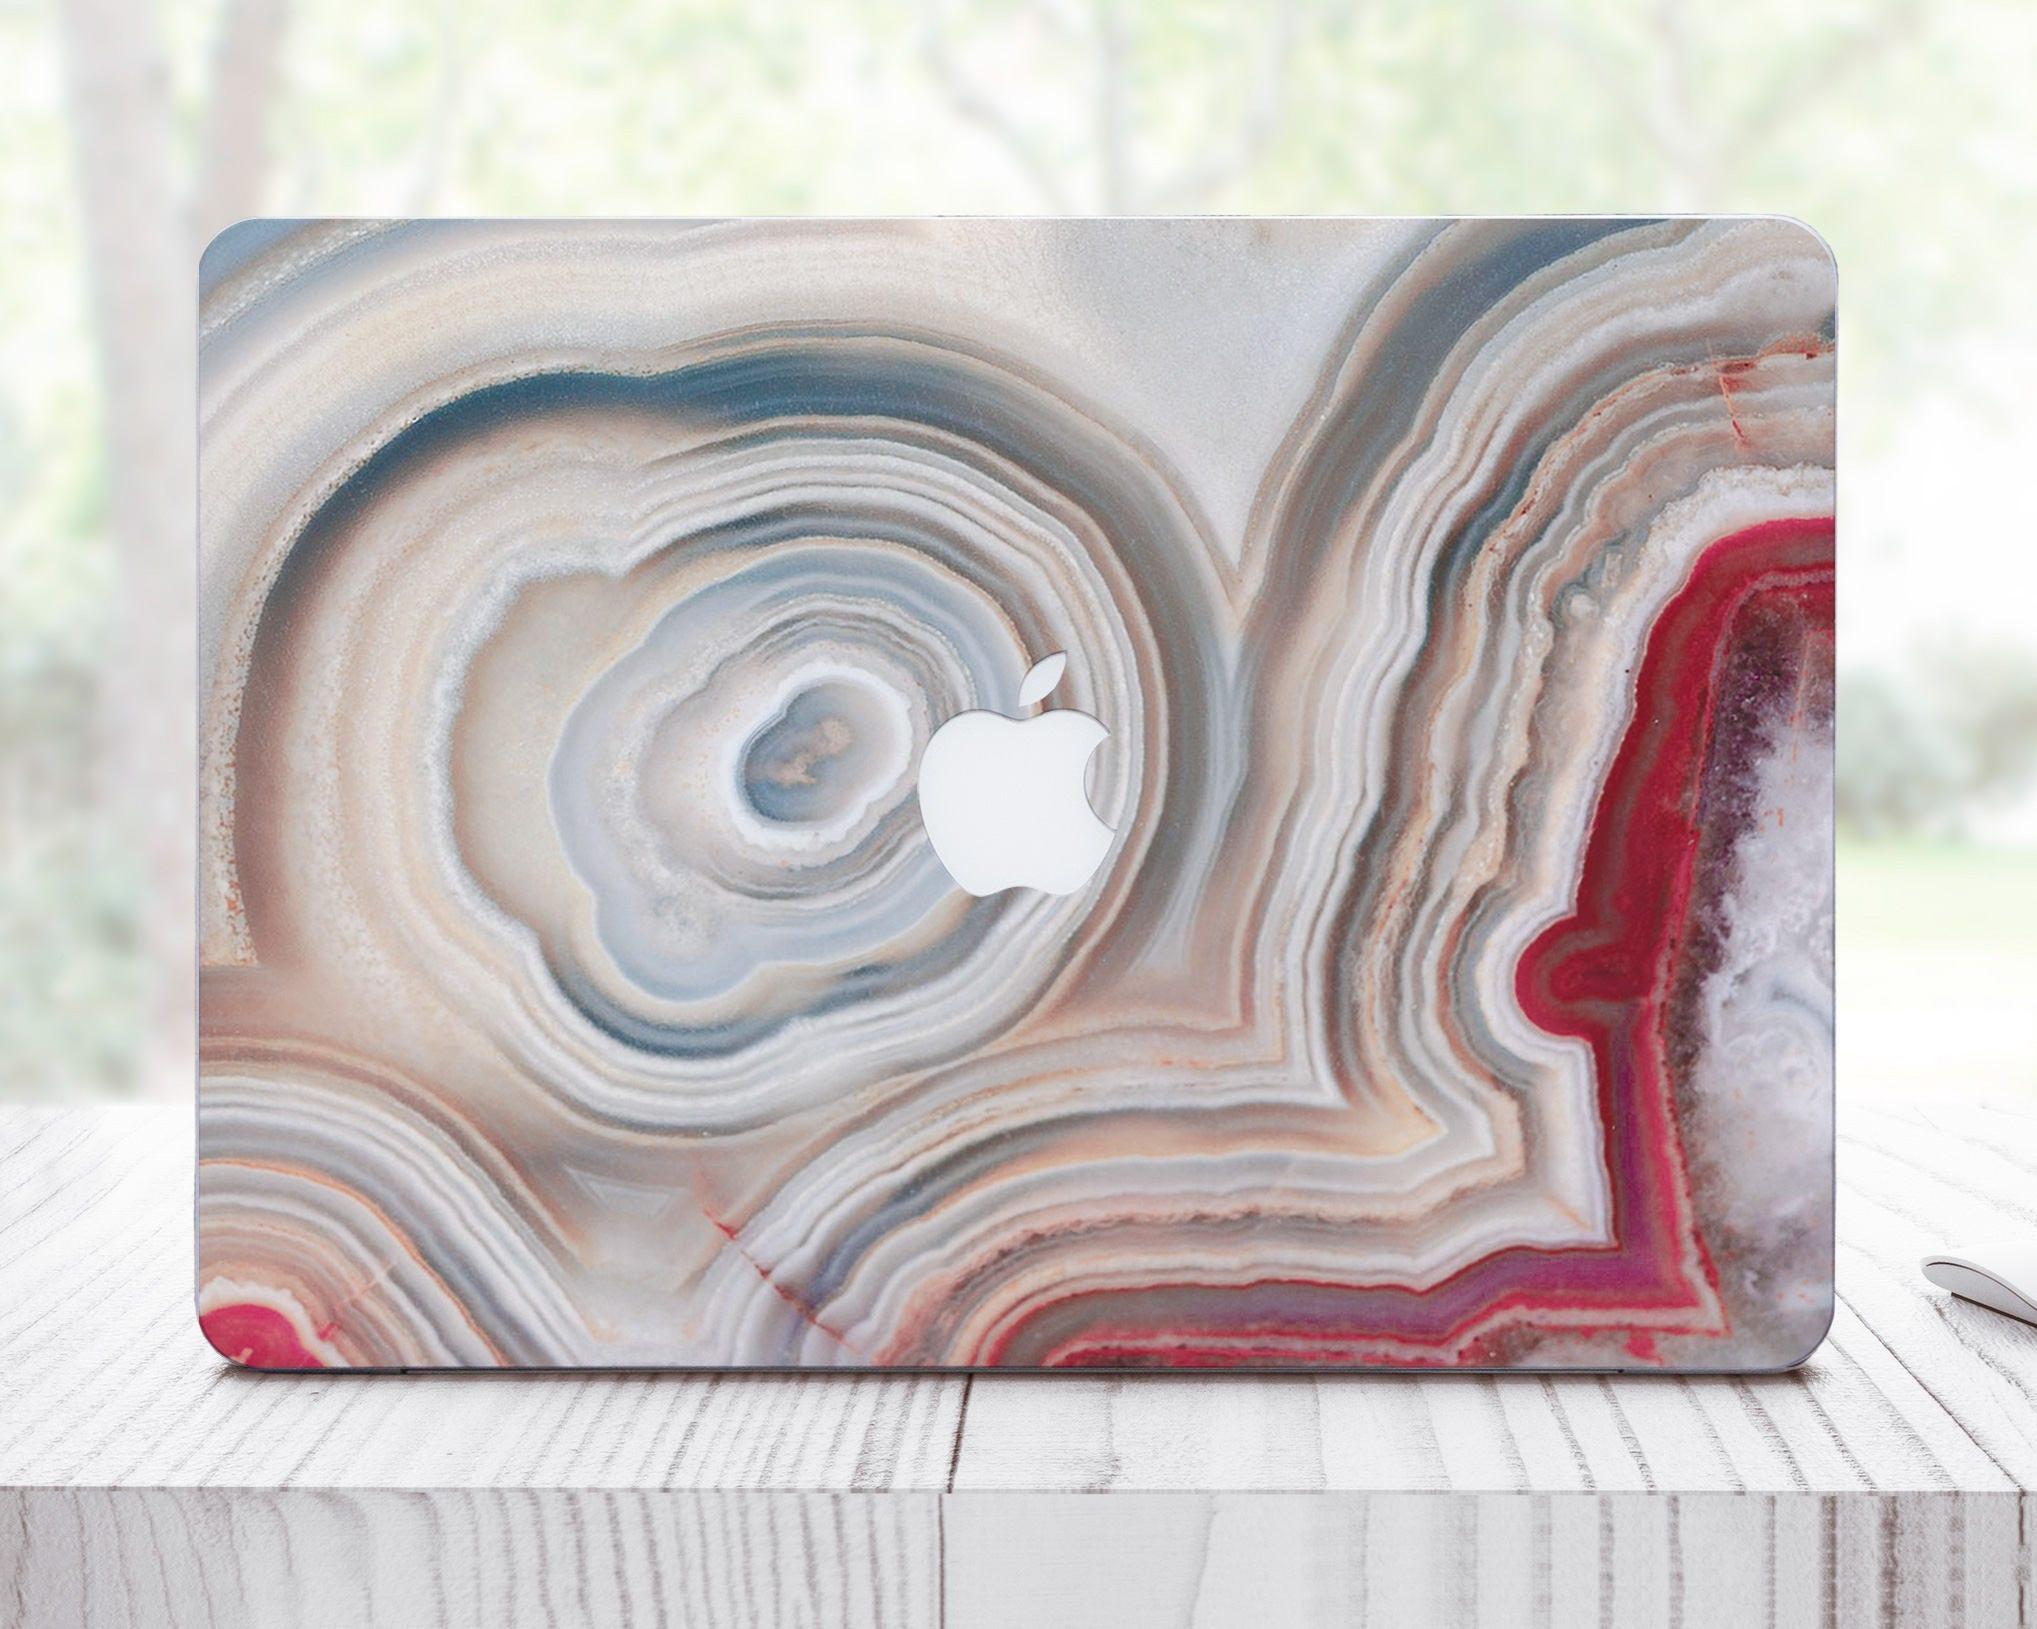 Marble Cover Pro Retina 15 Vinyl Skin MacBook Vinyl Decal Laptop Decal Red MacBook Pro Retina 13 Decal MacBook 12 Decal For MacBook ES0083